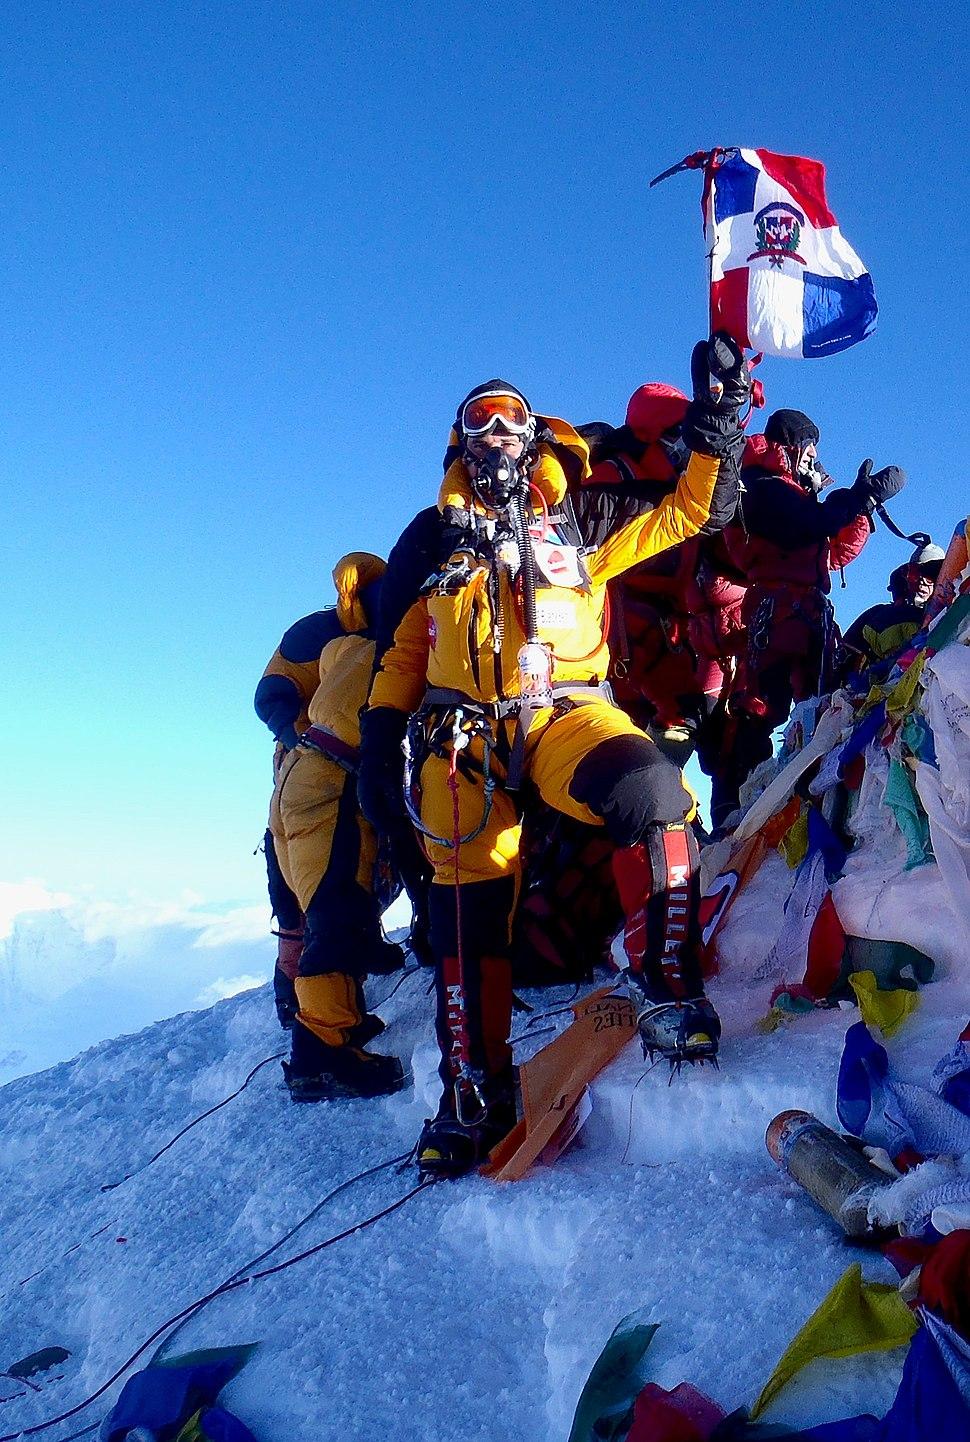 Iván Ernesto Gómez Carrasco en la cima del Monte Everest